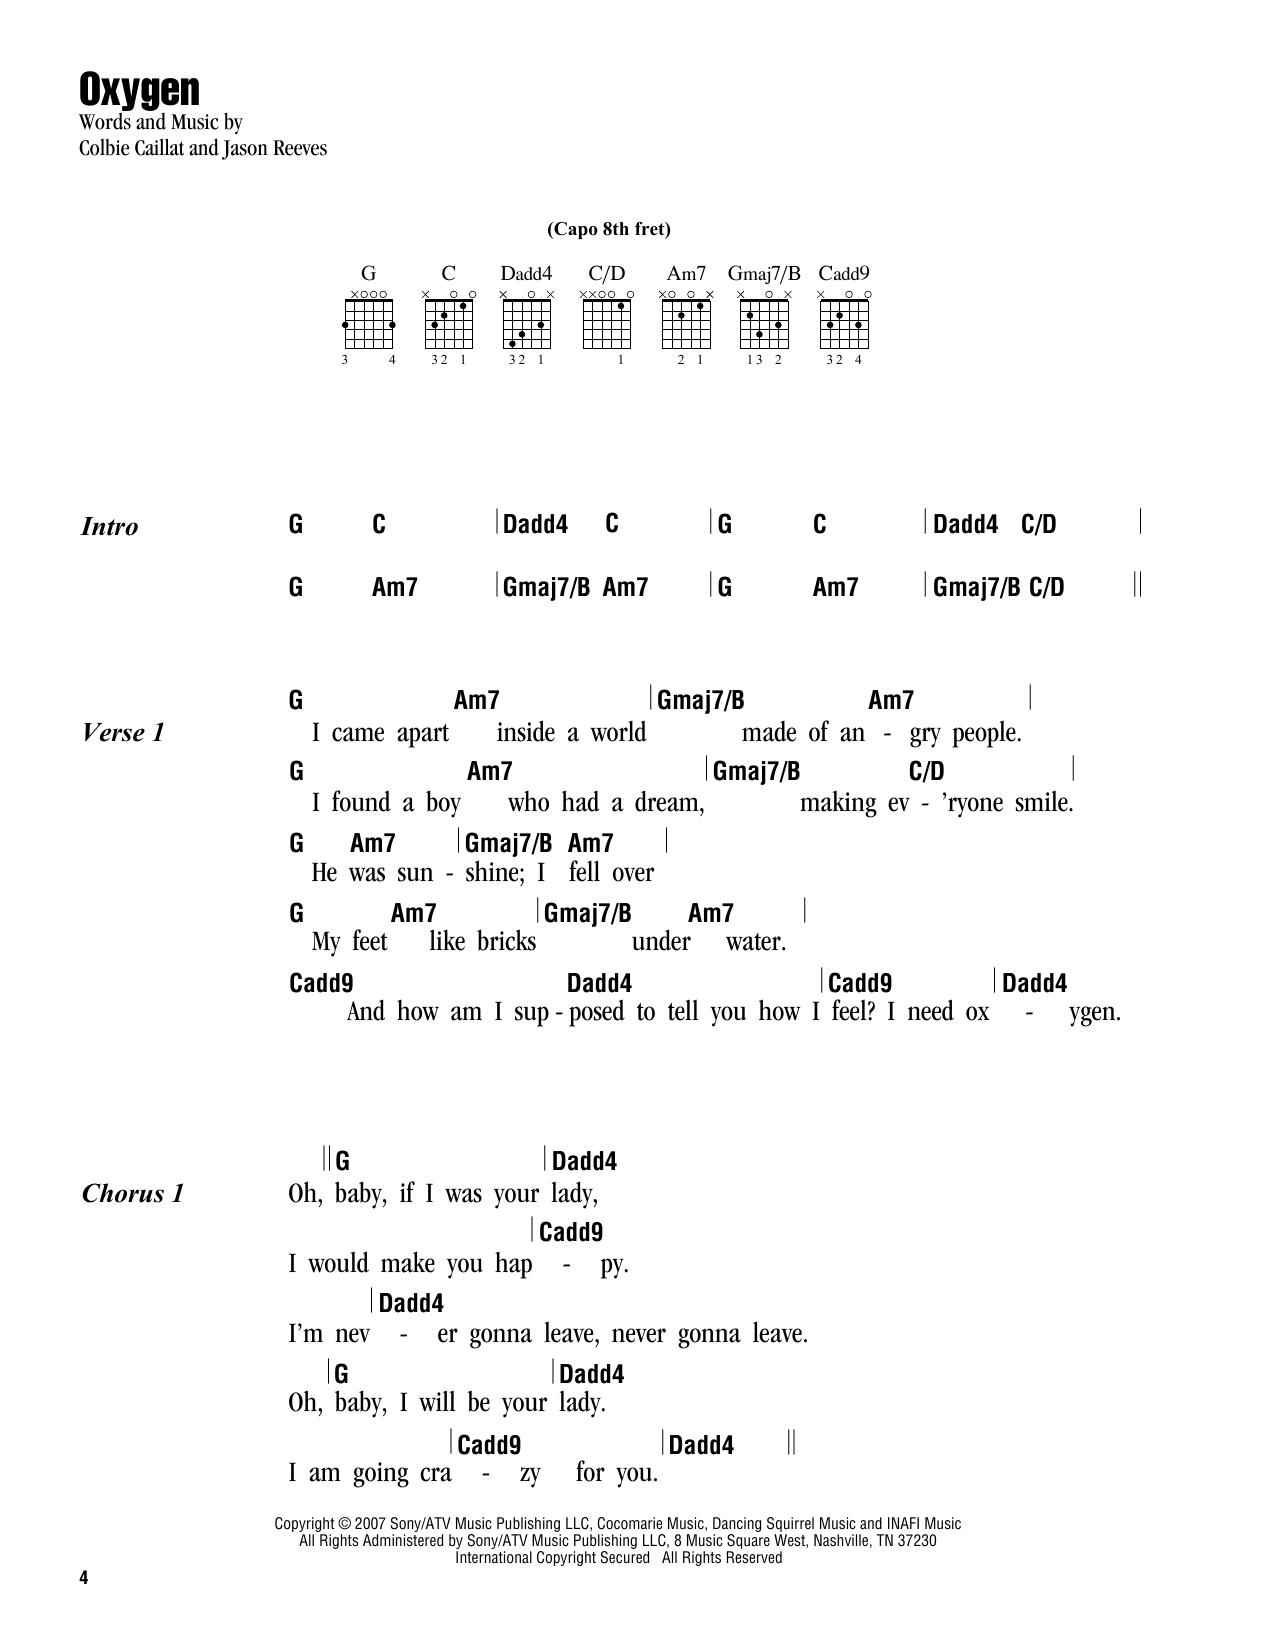 Oxygen sheet music by colbie caillat lyrics chords 163252 colbie caillat oxygen lyrics chords hexwebz Images